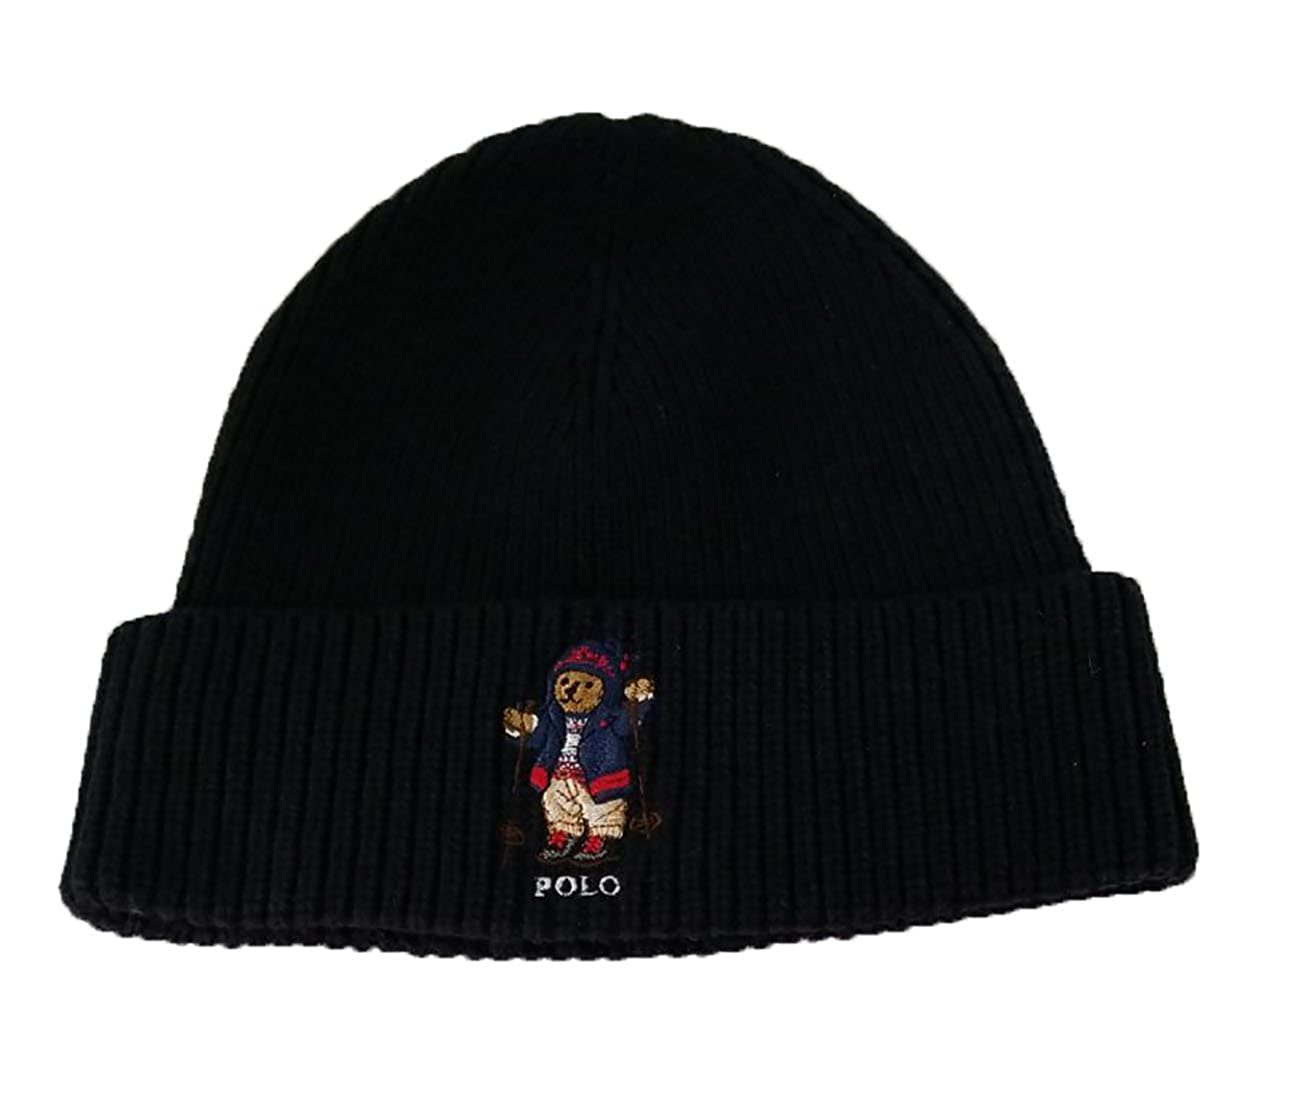 833dcdc9 Ralph Lauren Polo Men's Polo Bear Hat Skull Cap (Black/Ski Bear): Amazon.in:  Clothing & Accessories